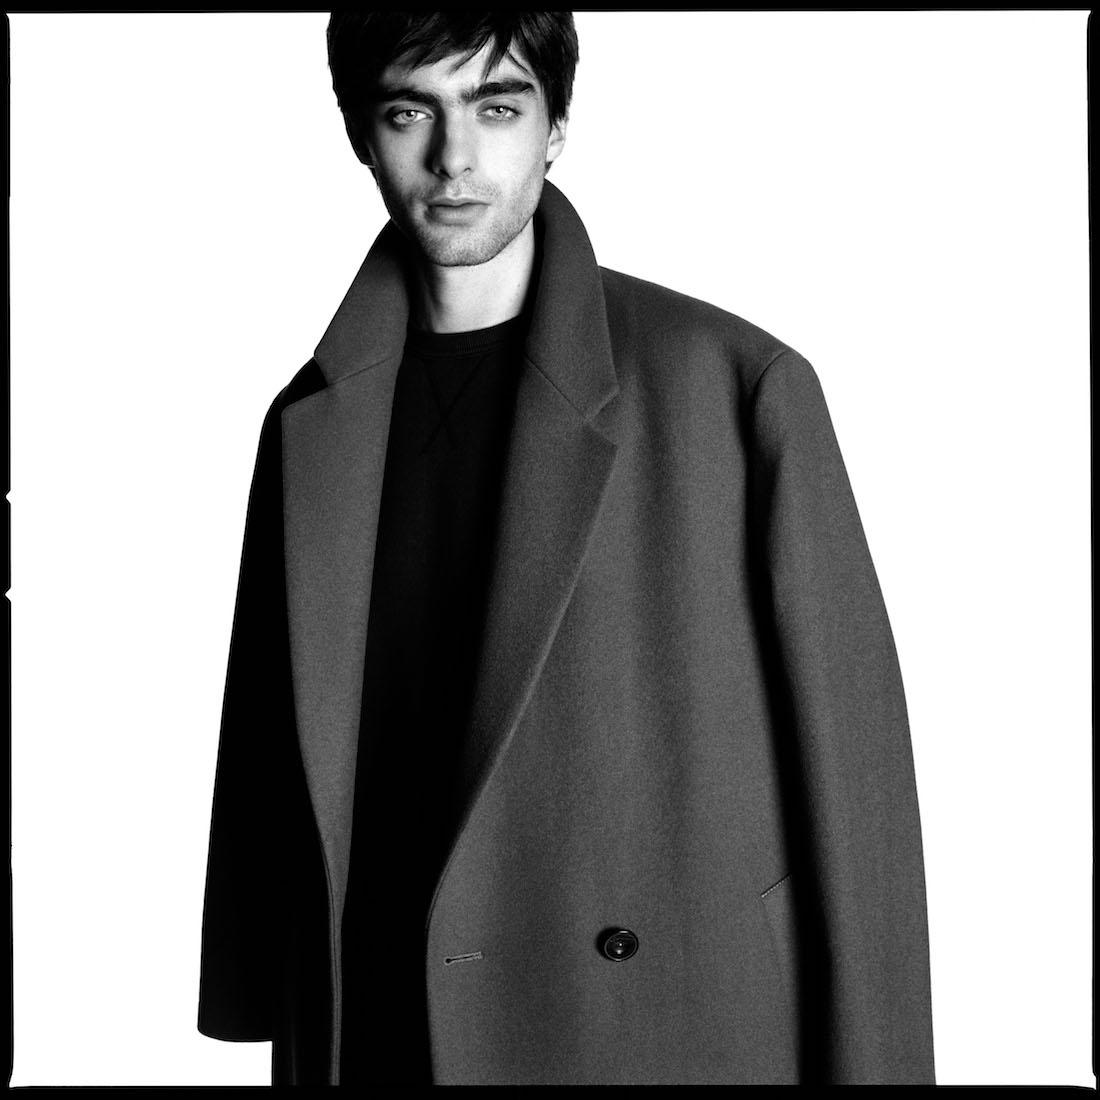 177 5619 Lennon Gallagher Zara Man L 6